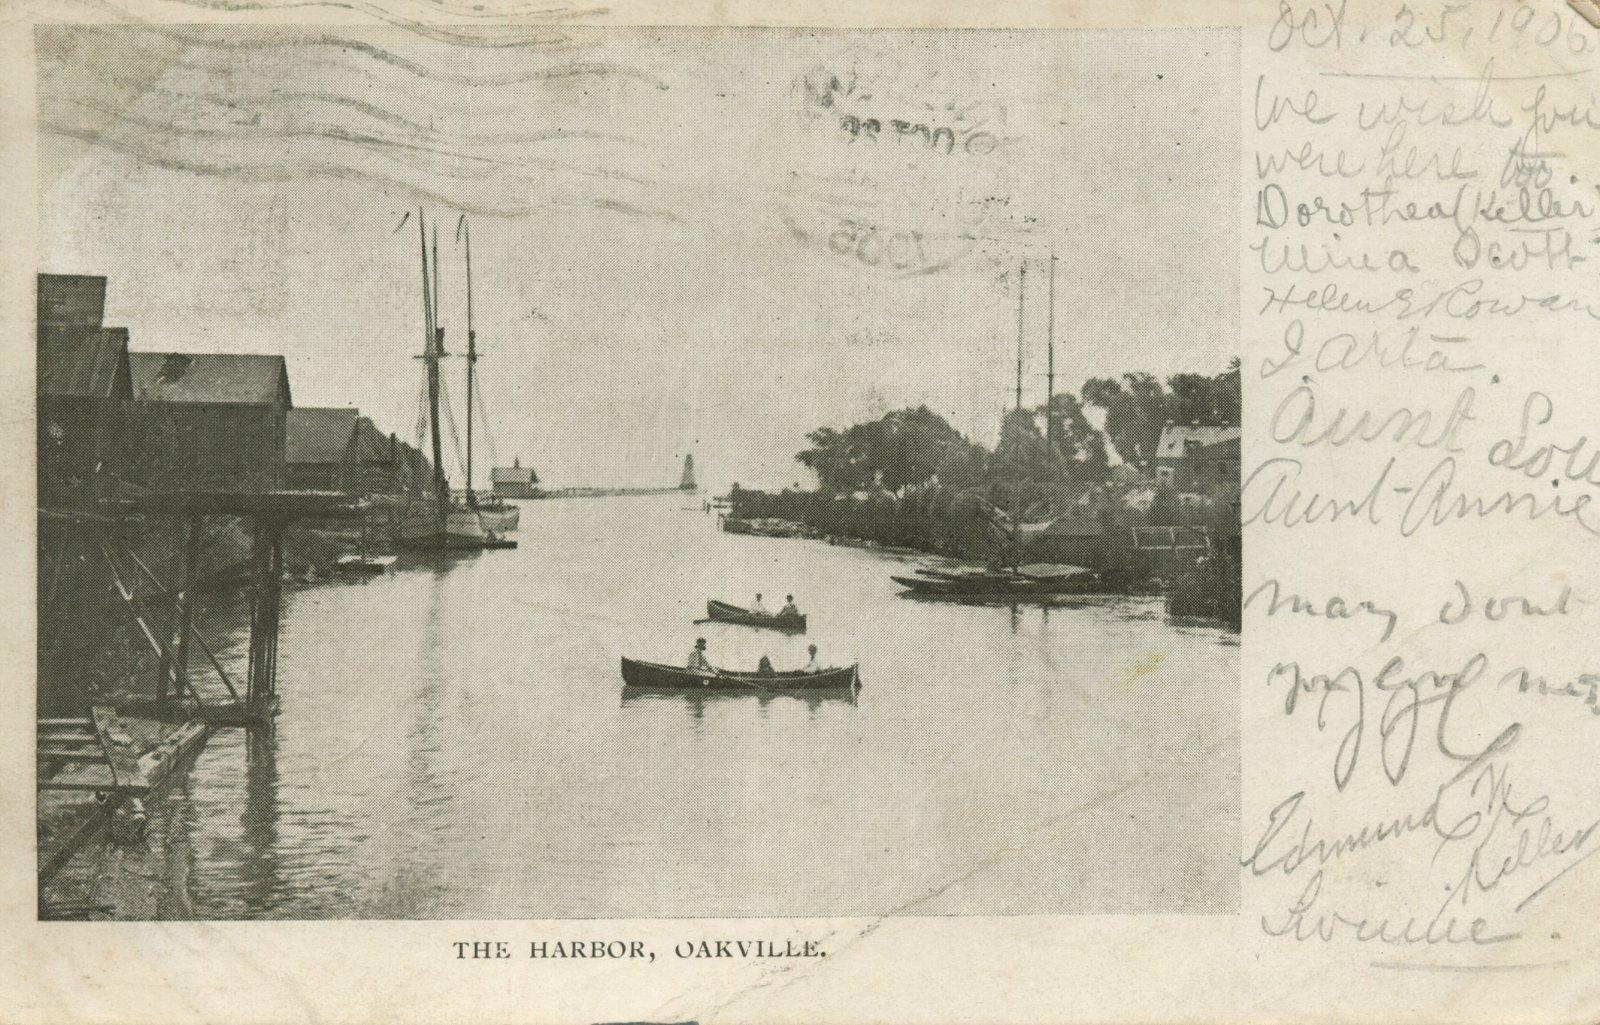 The harbor, Oakville.